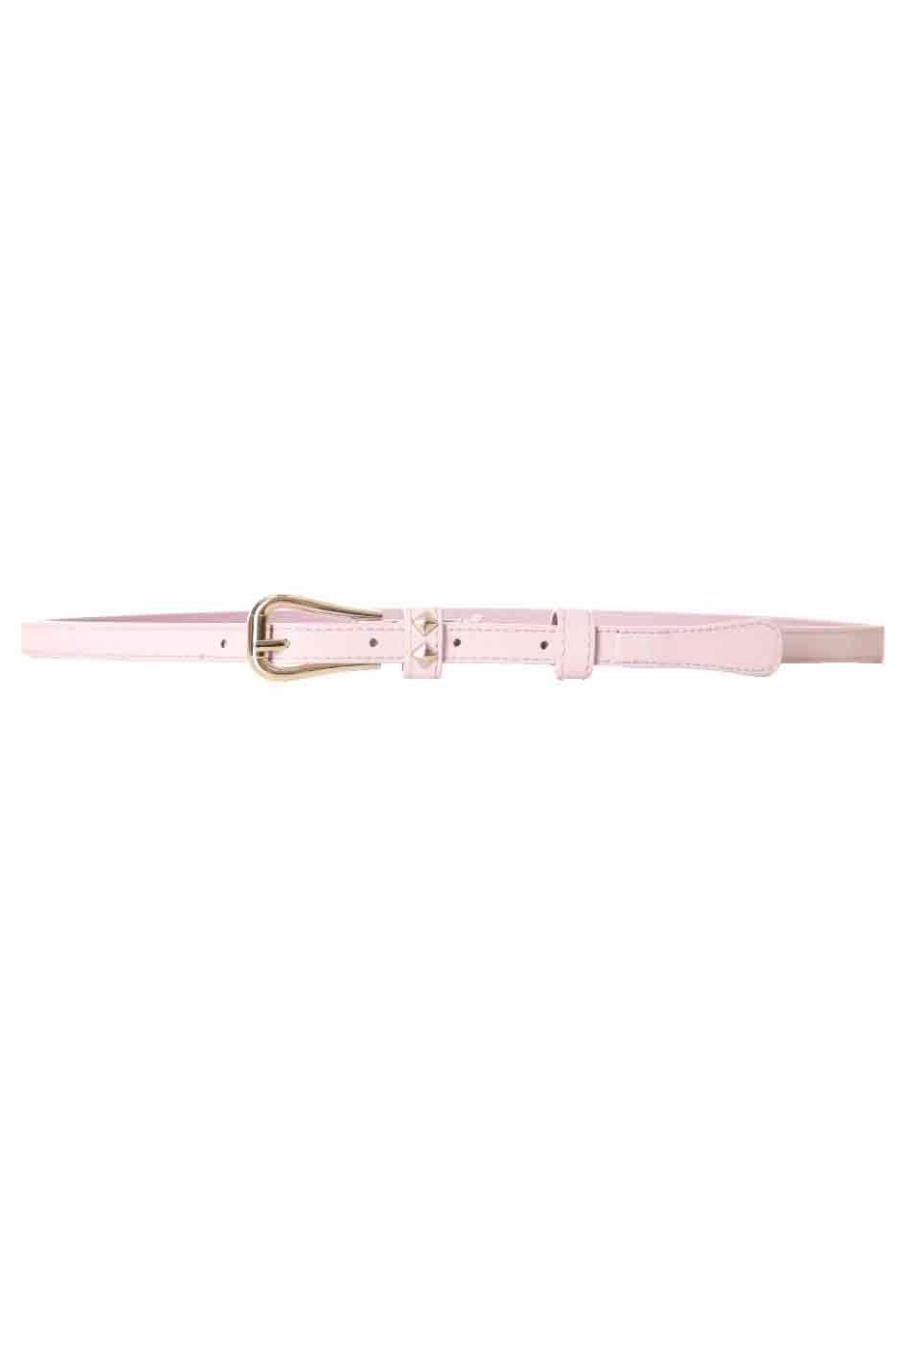 Dunne roze riem met gesp SG-0469